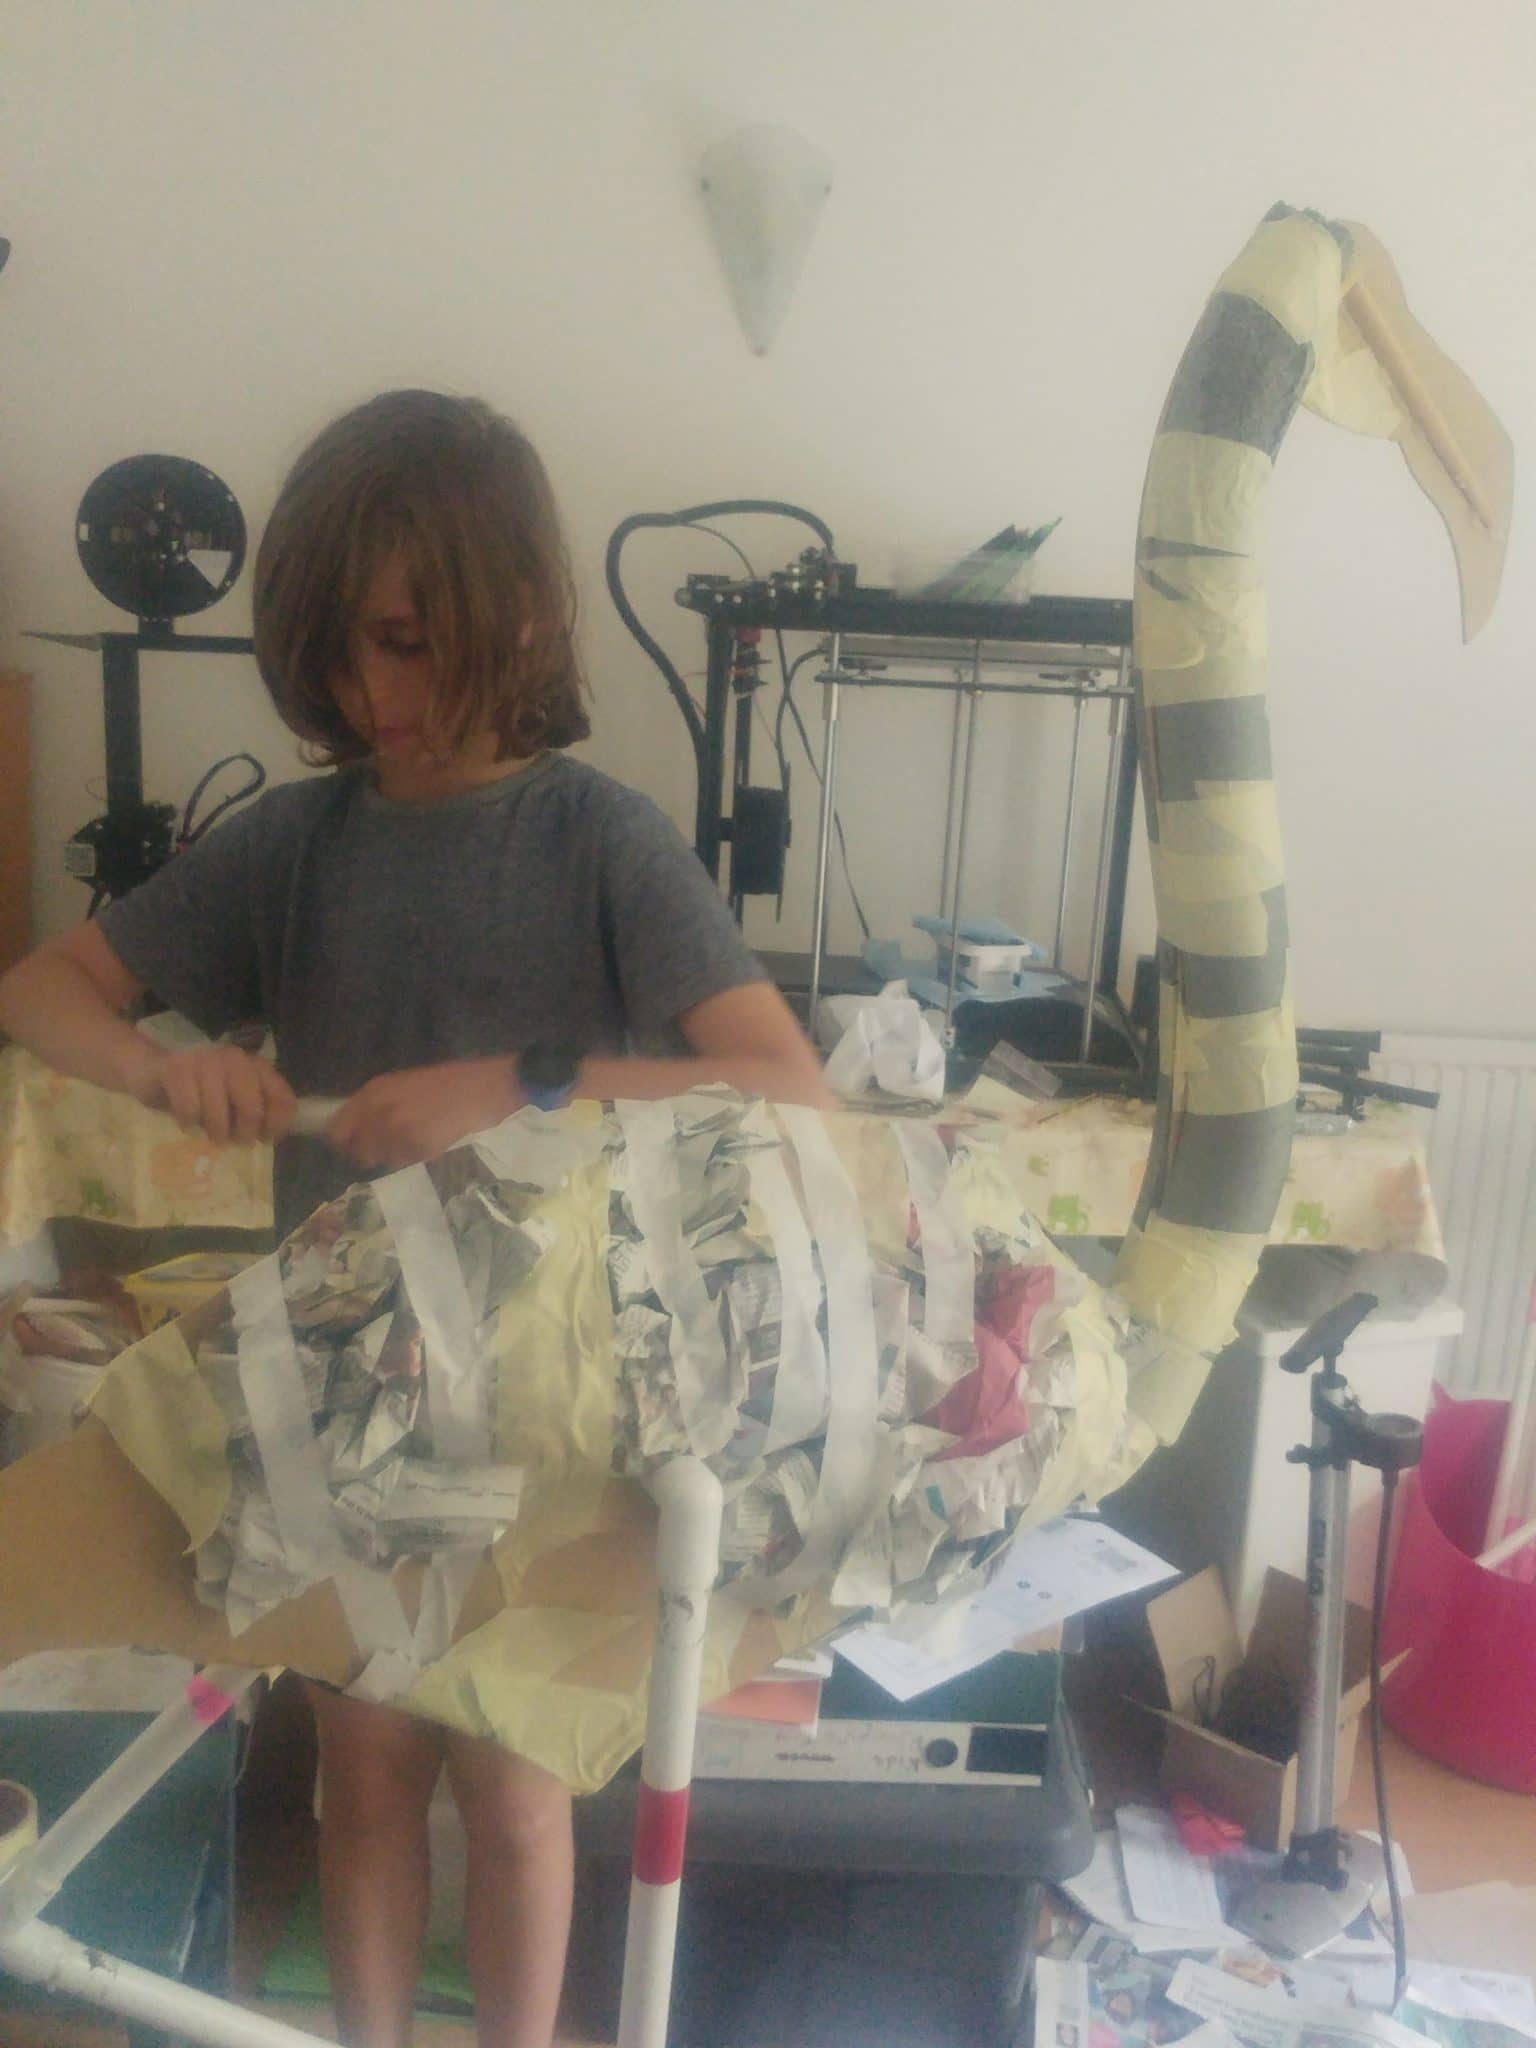 Paper mache flamingo armature with paper padding